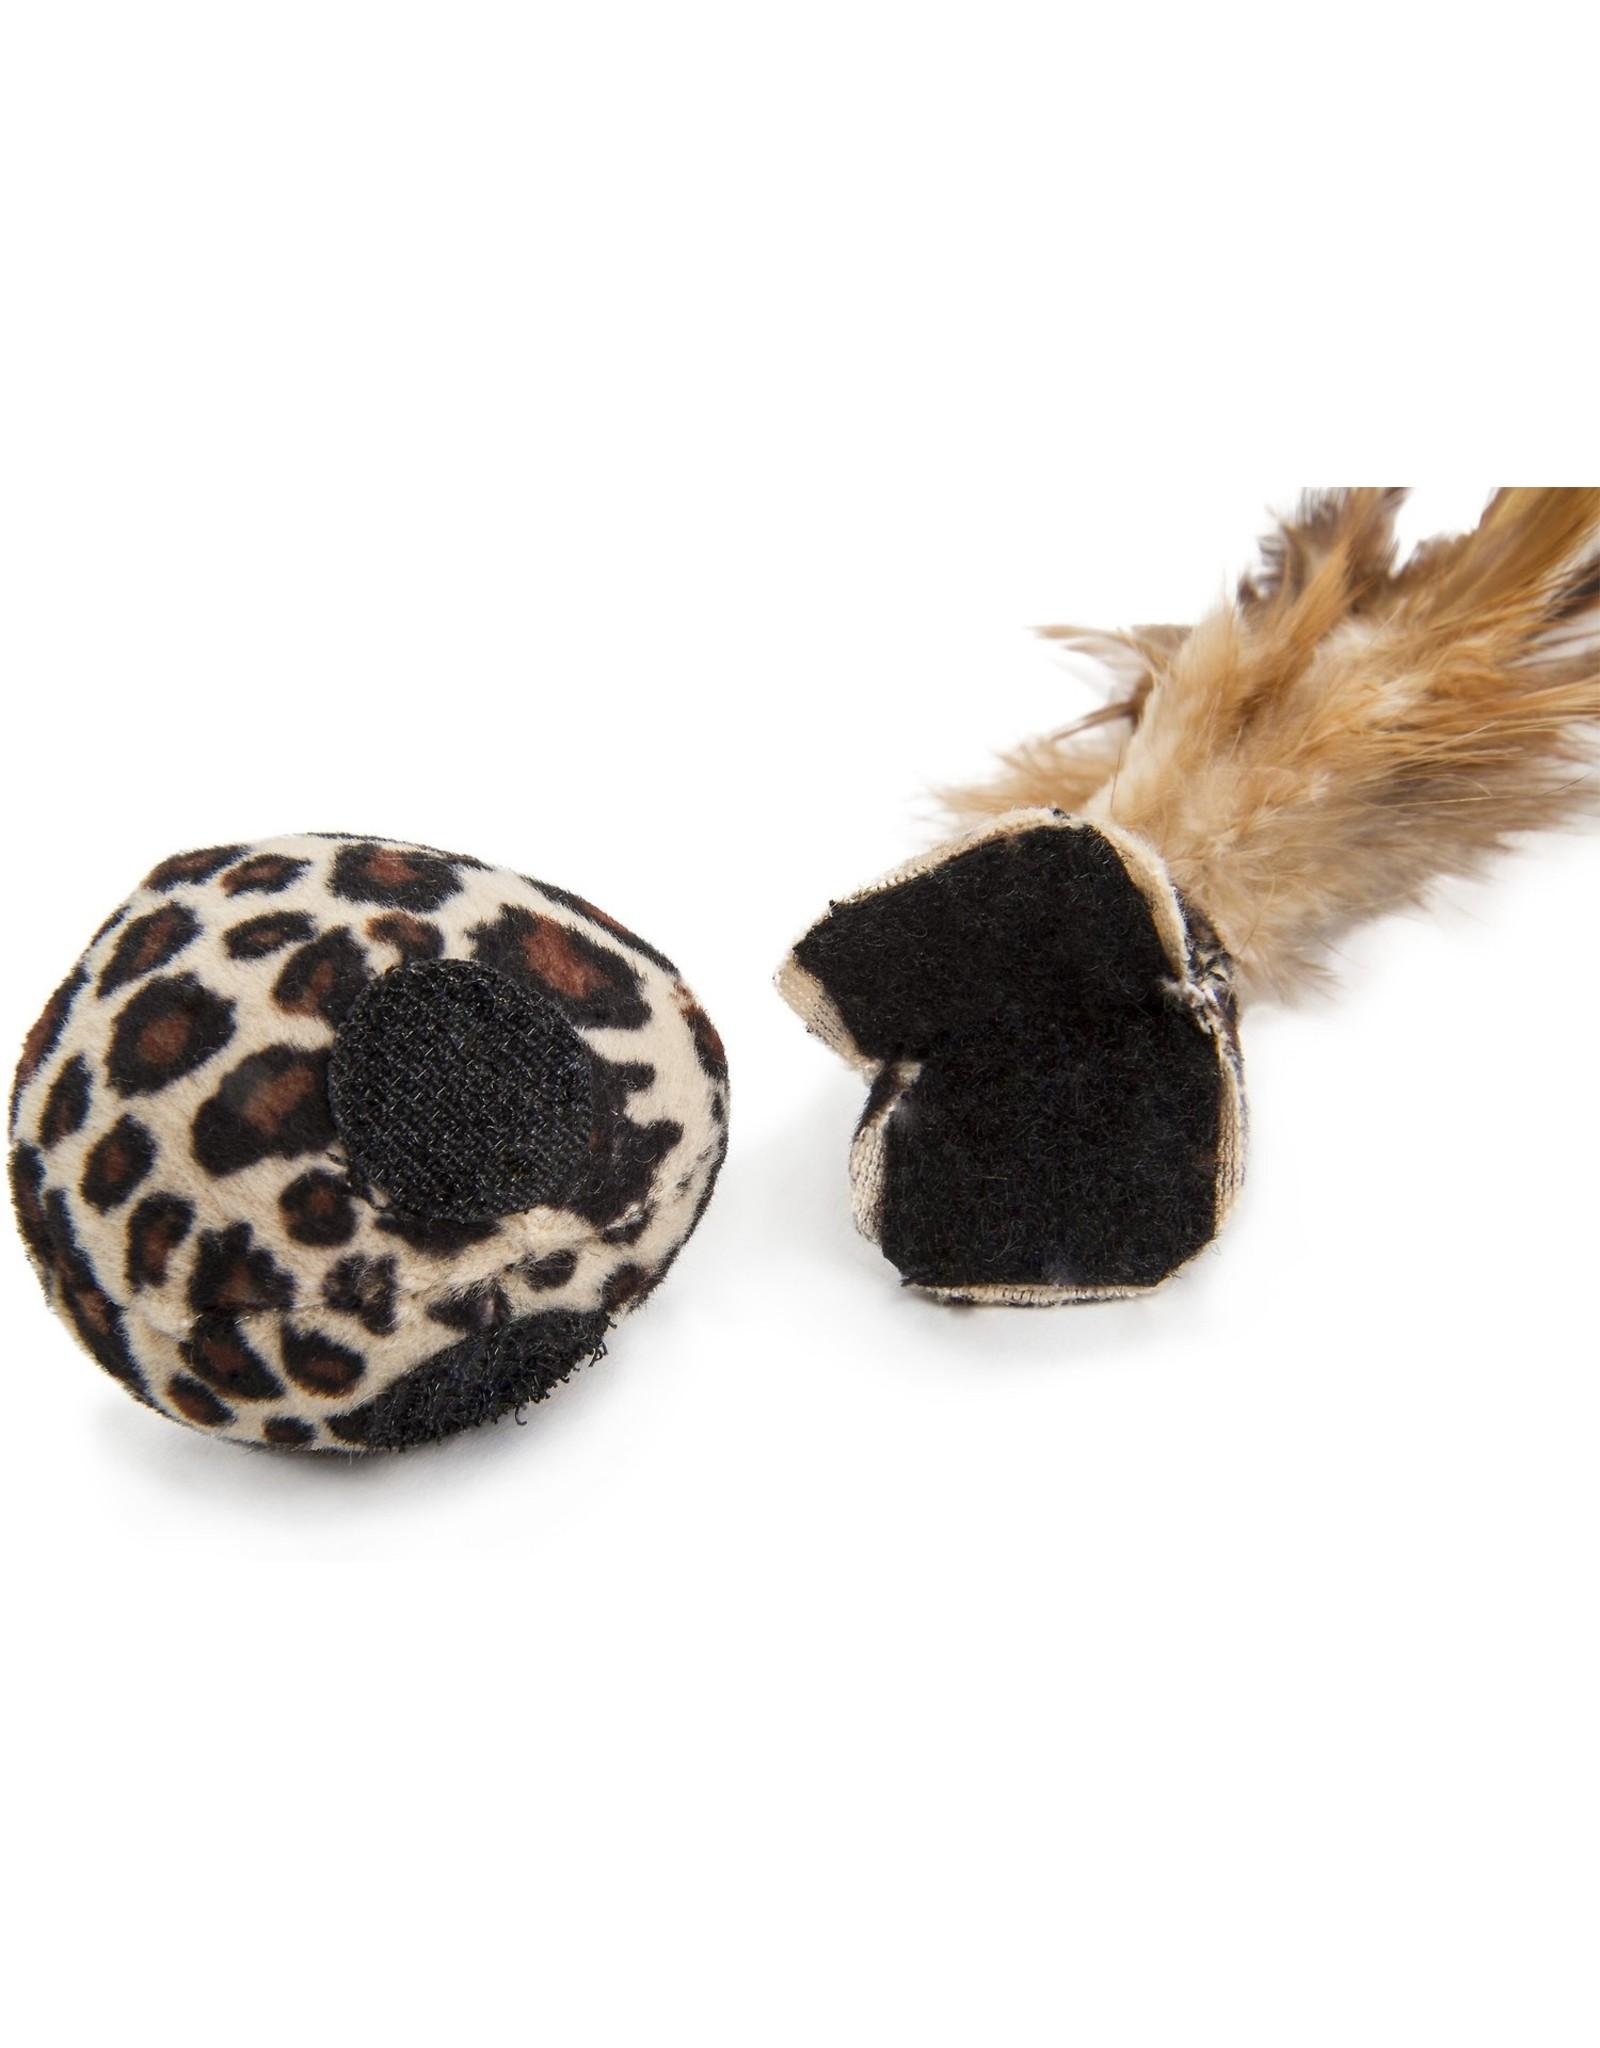 Petlinks Petlinks Feather Flips Cat Toys 2pk